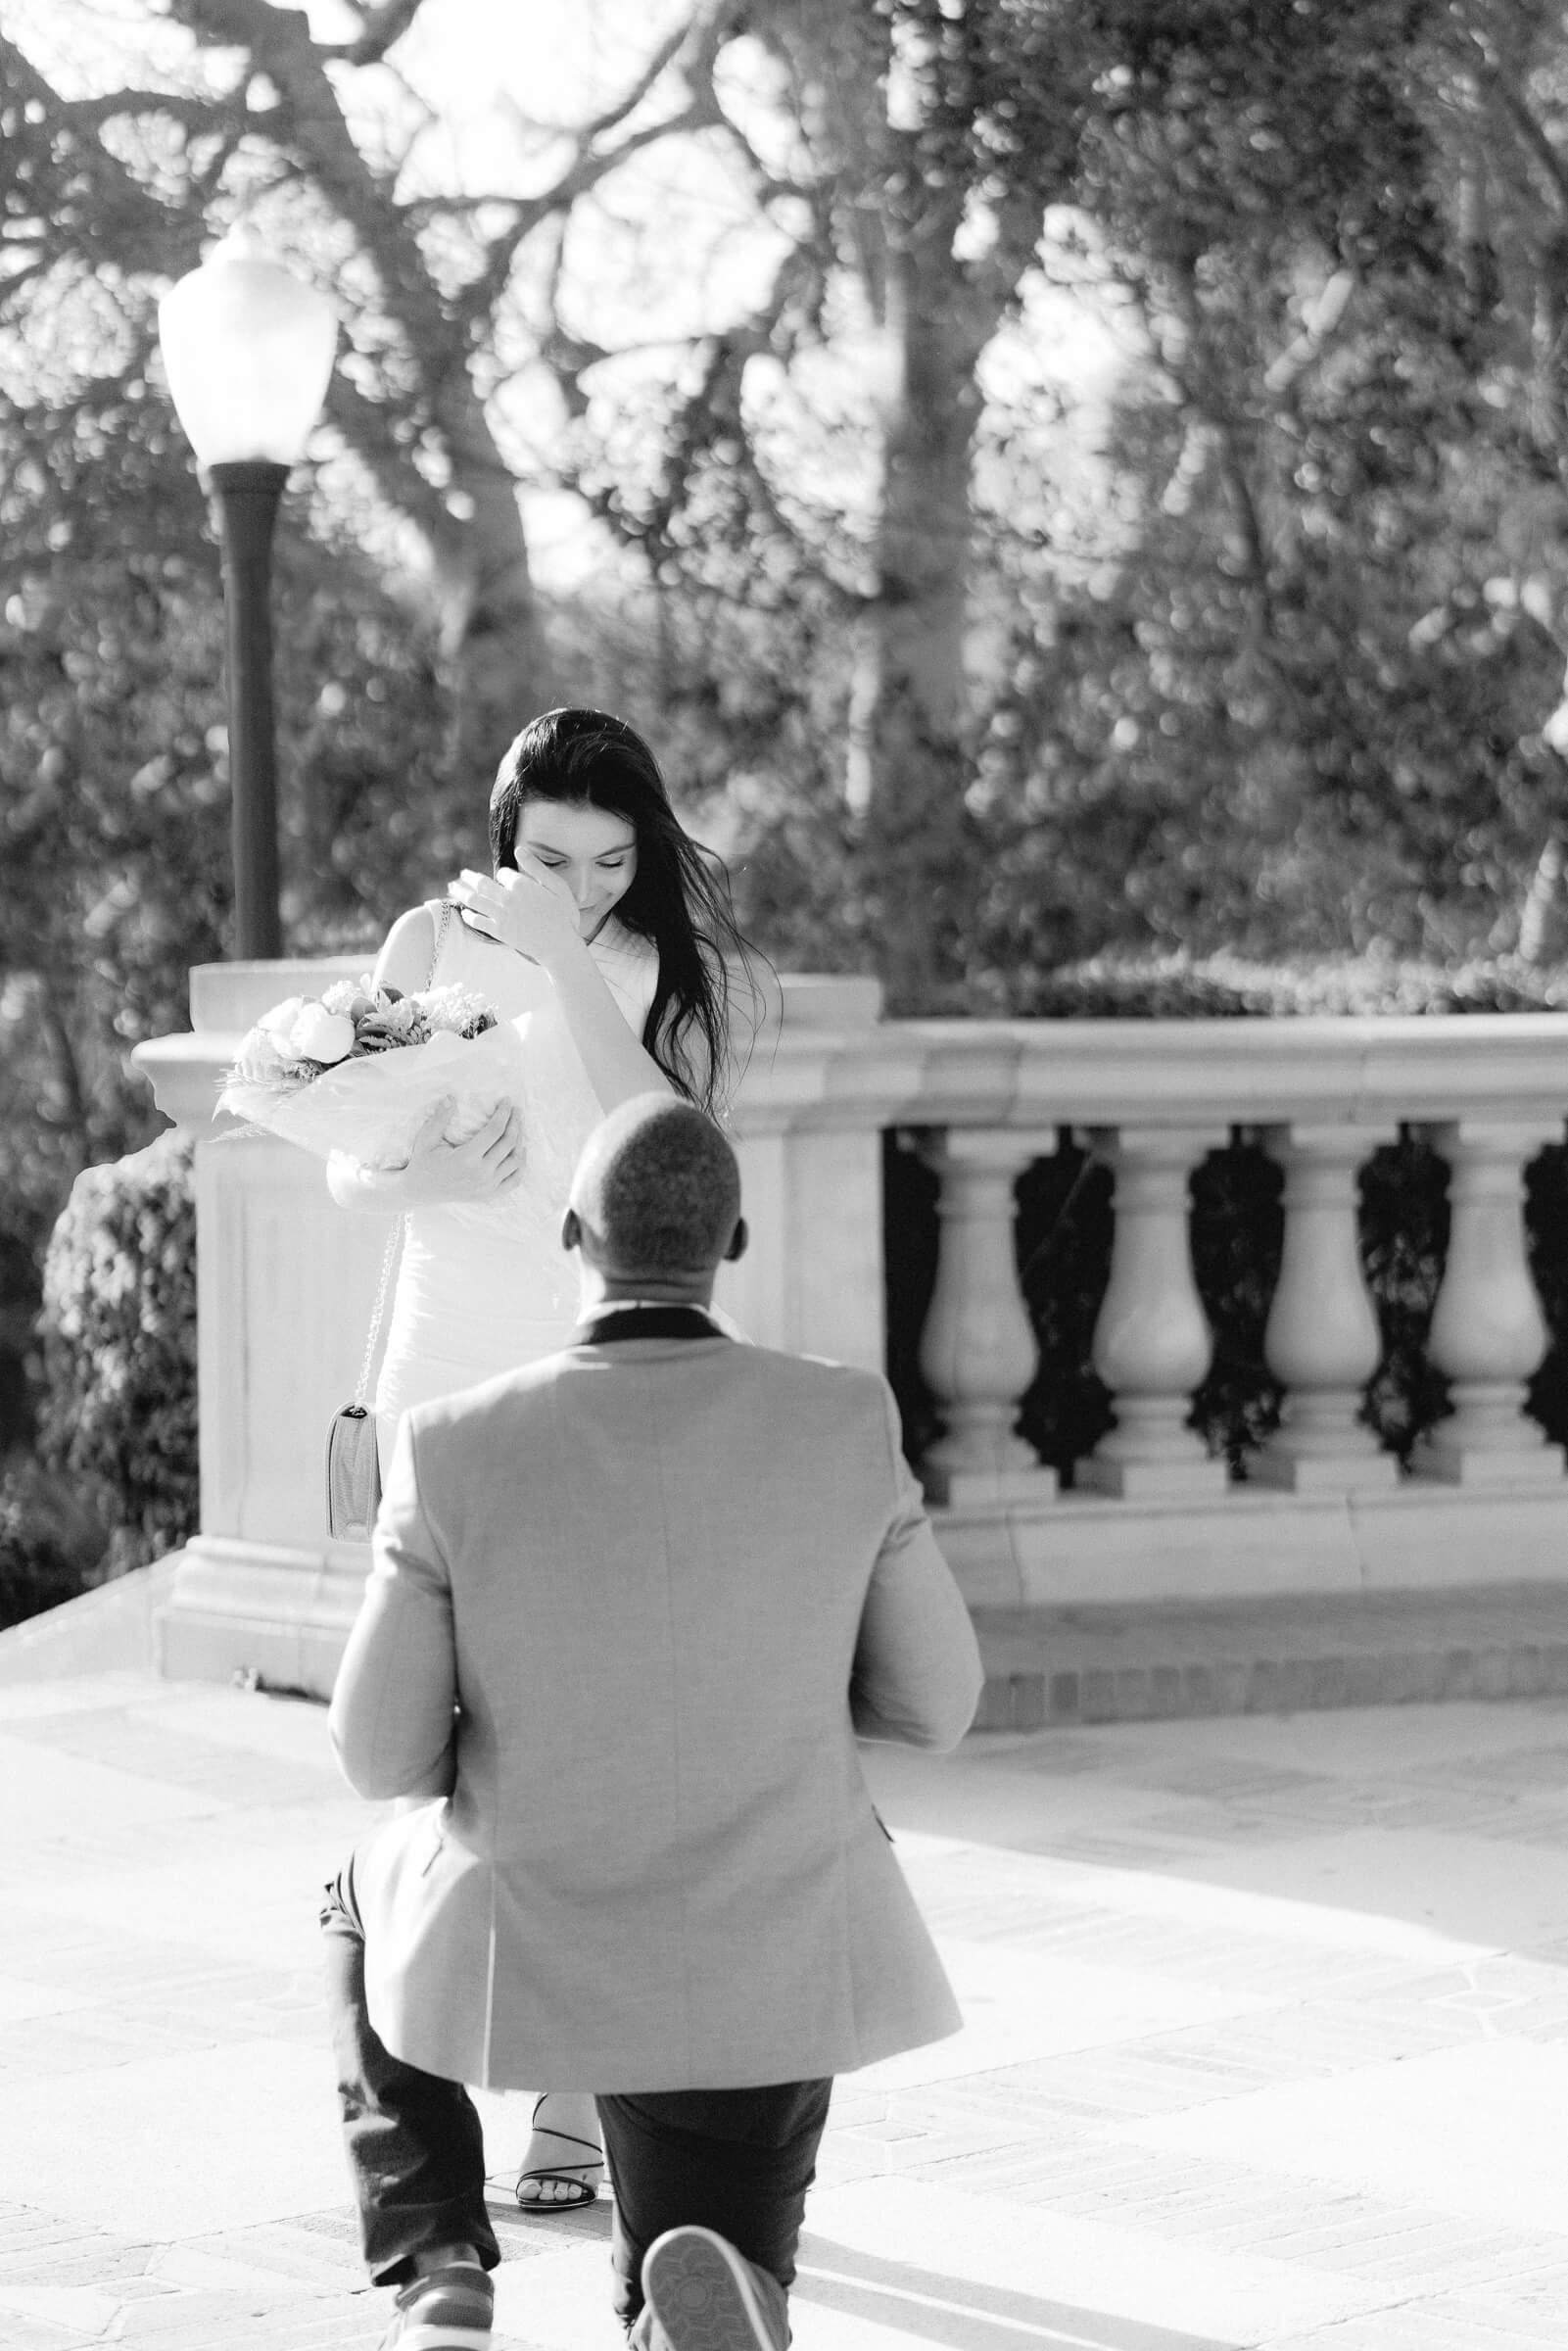 ucla-los-angeles-proposal-photographer-7.jpg